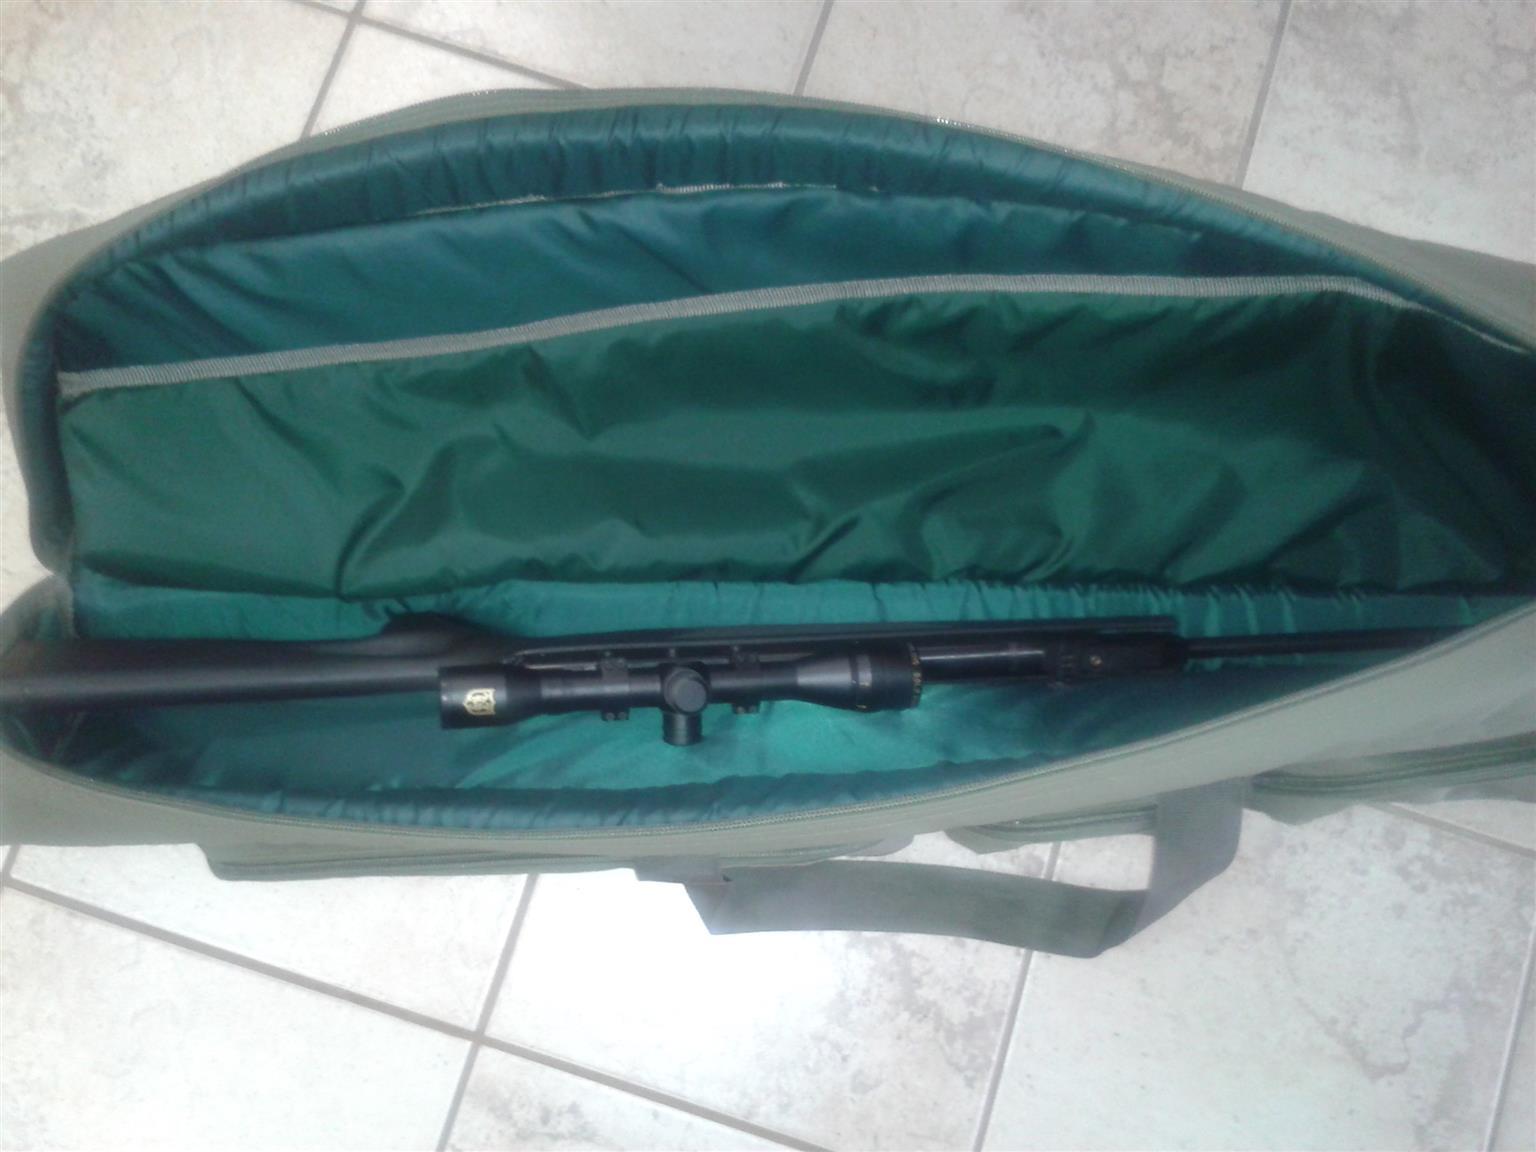 Custom made rifle and hand gun bags